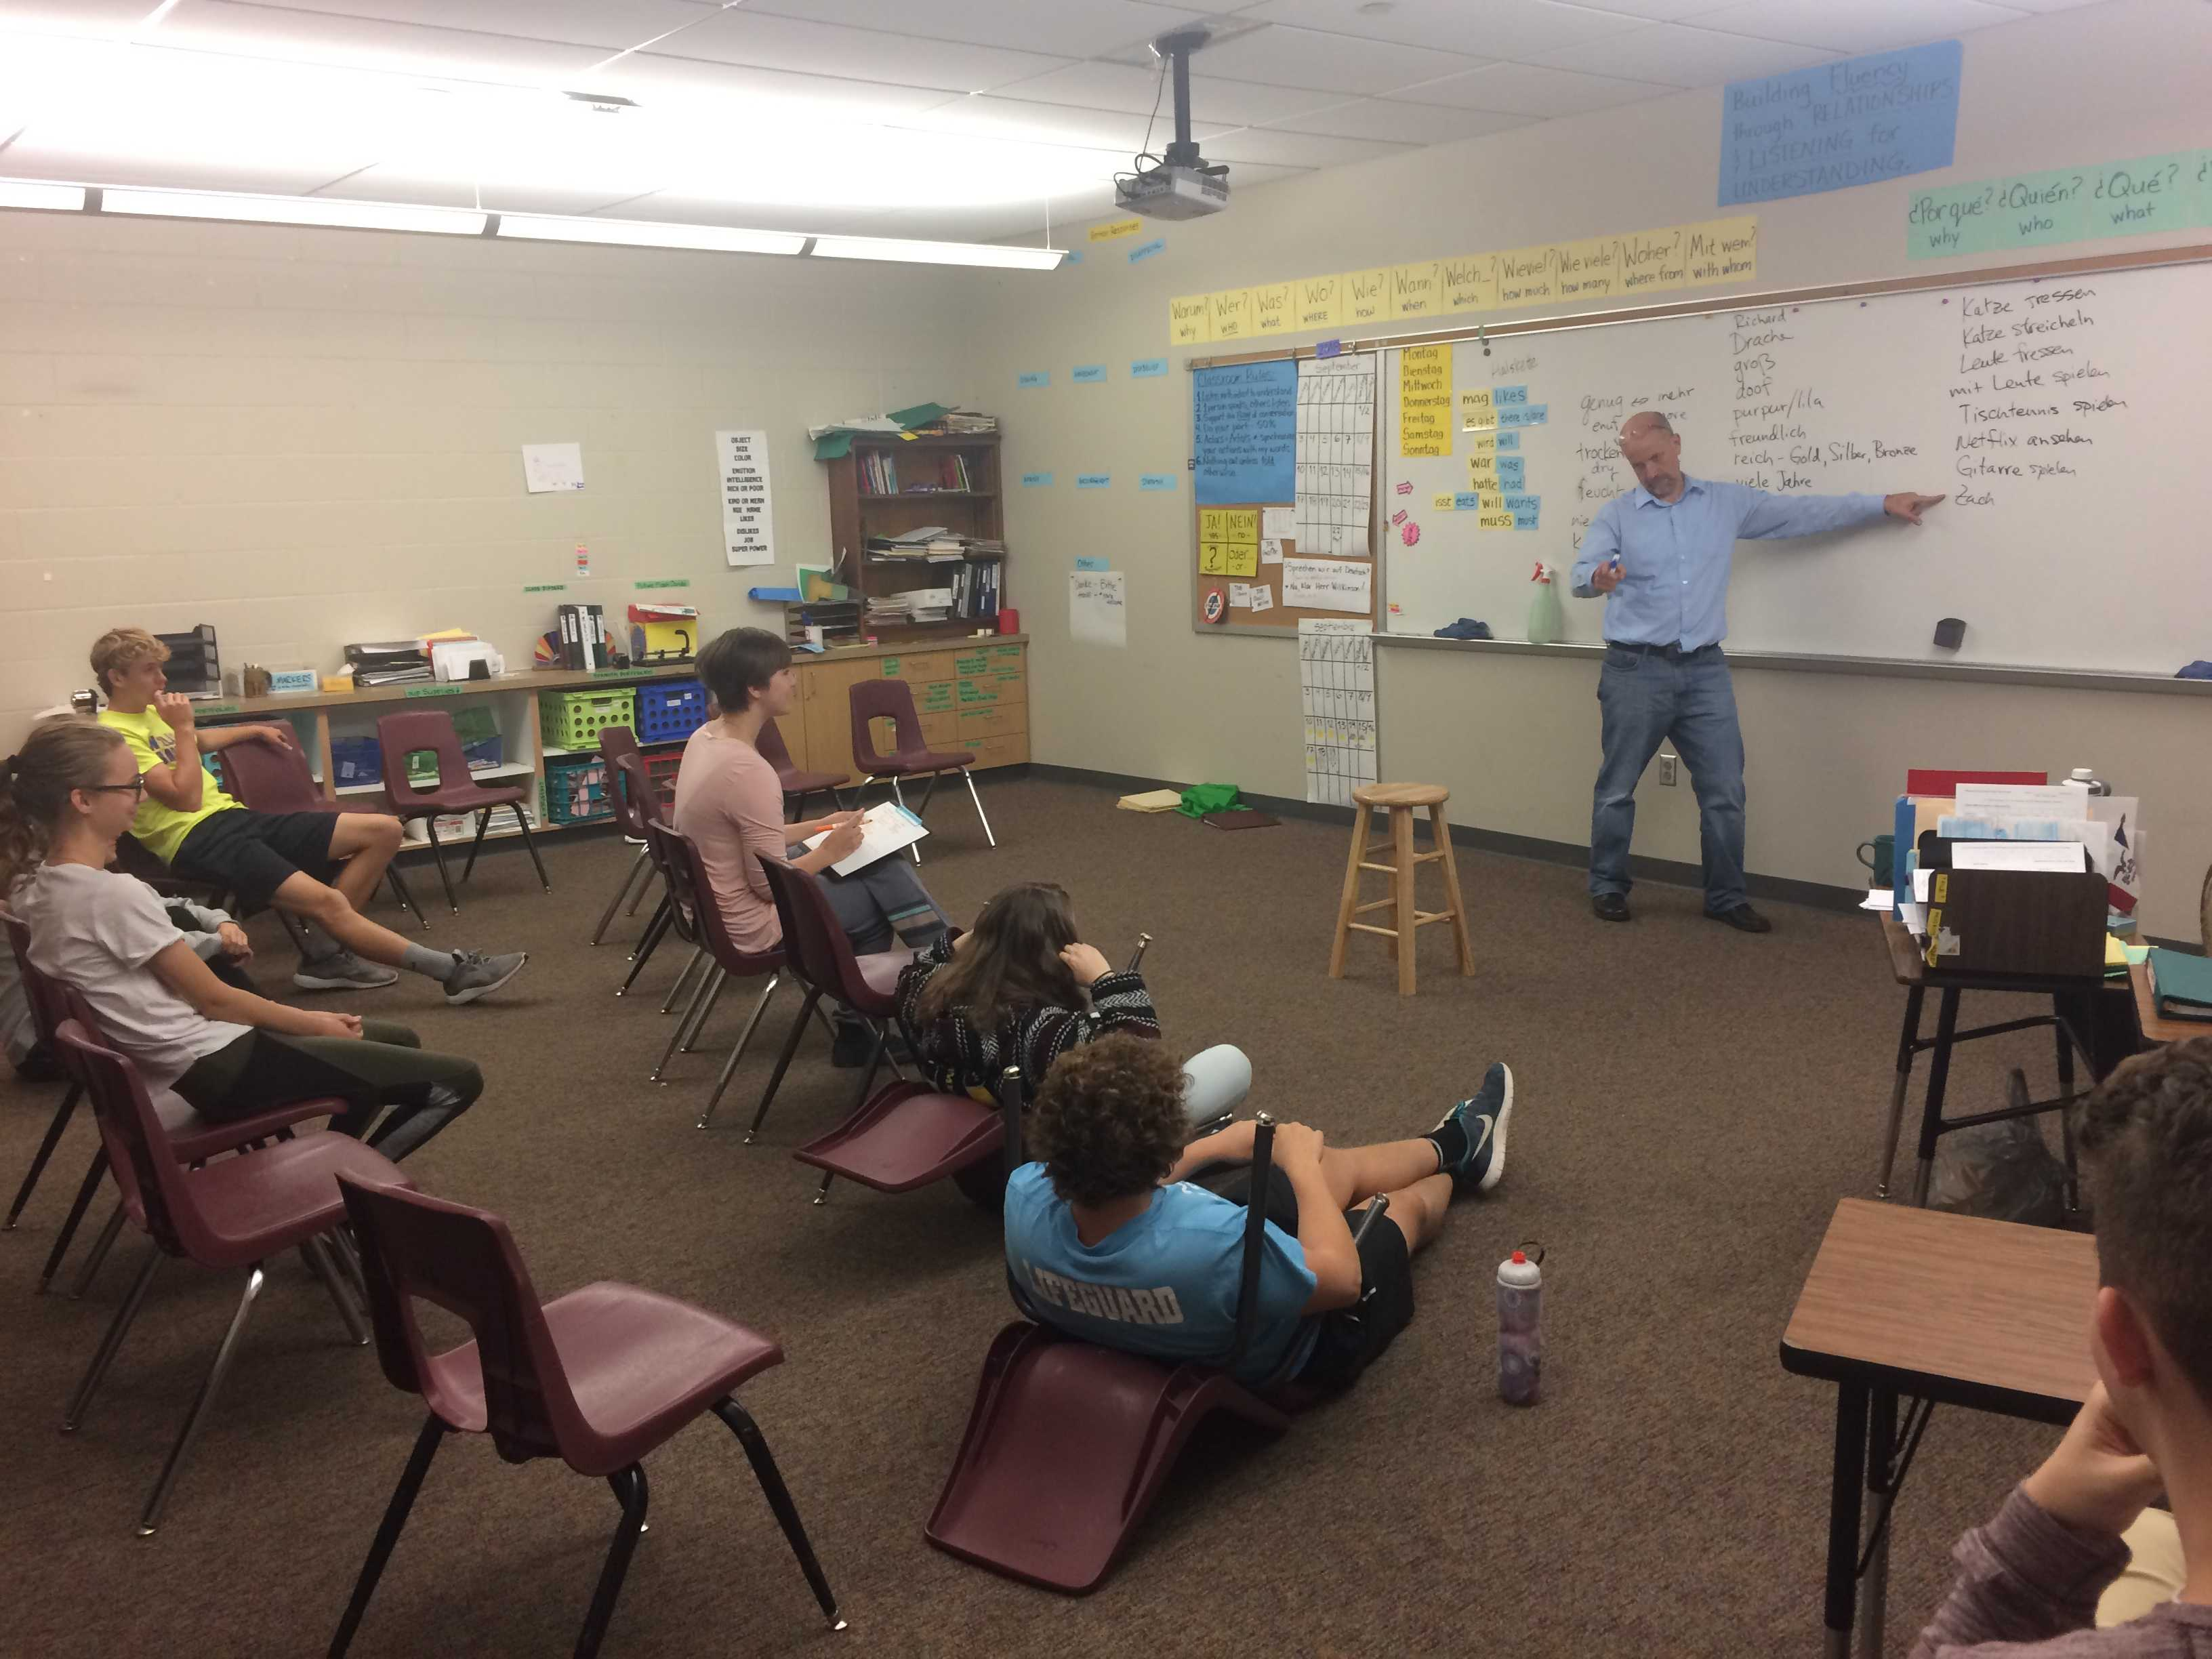 Teachers Use New Teaching Style of No Desks